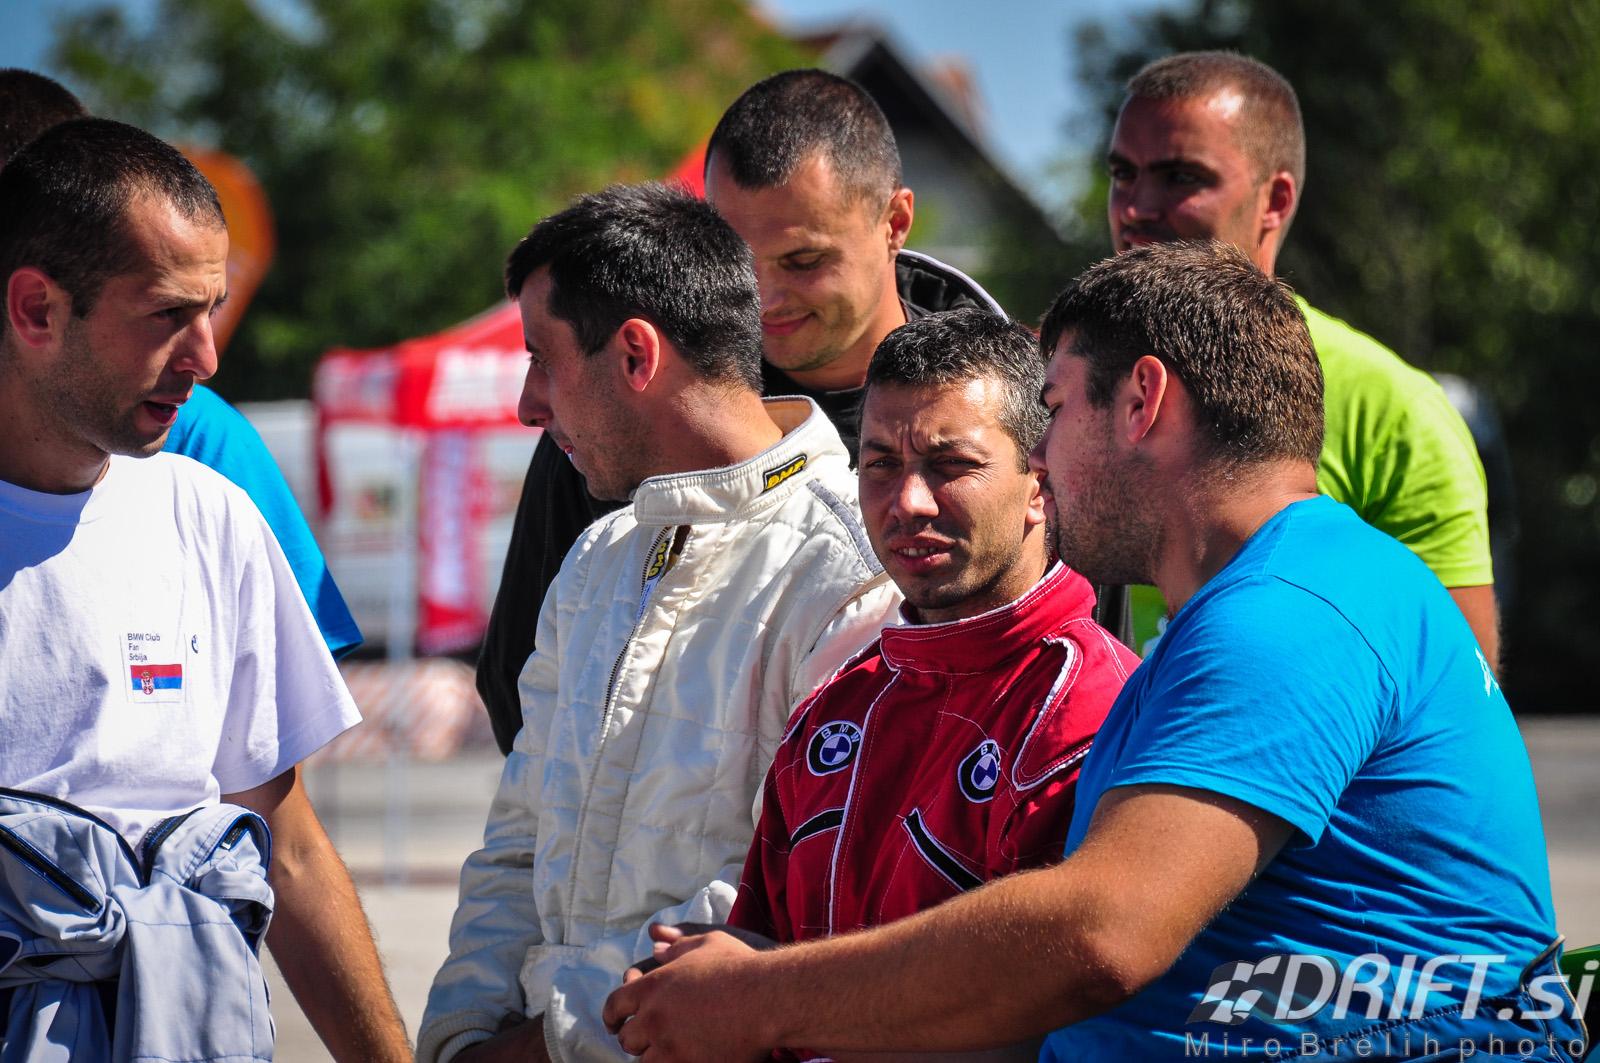 Čačak, Srbija, 8.9.2013